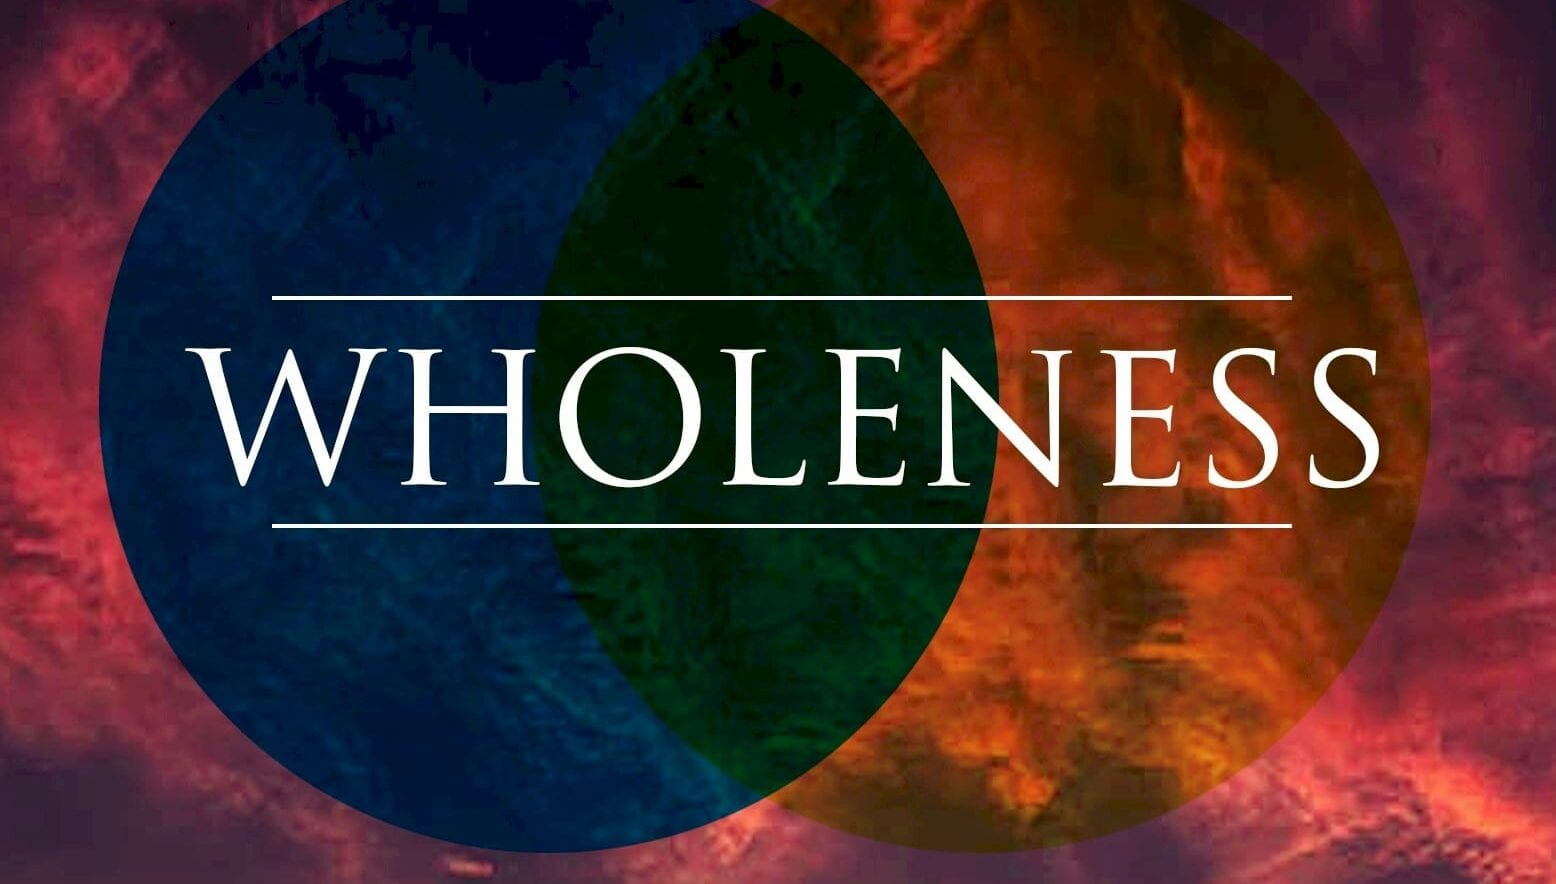 Buy Wholeness